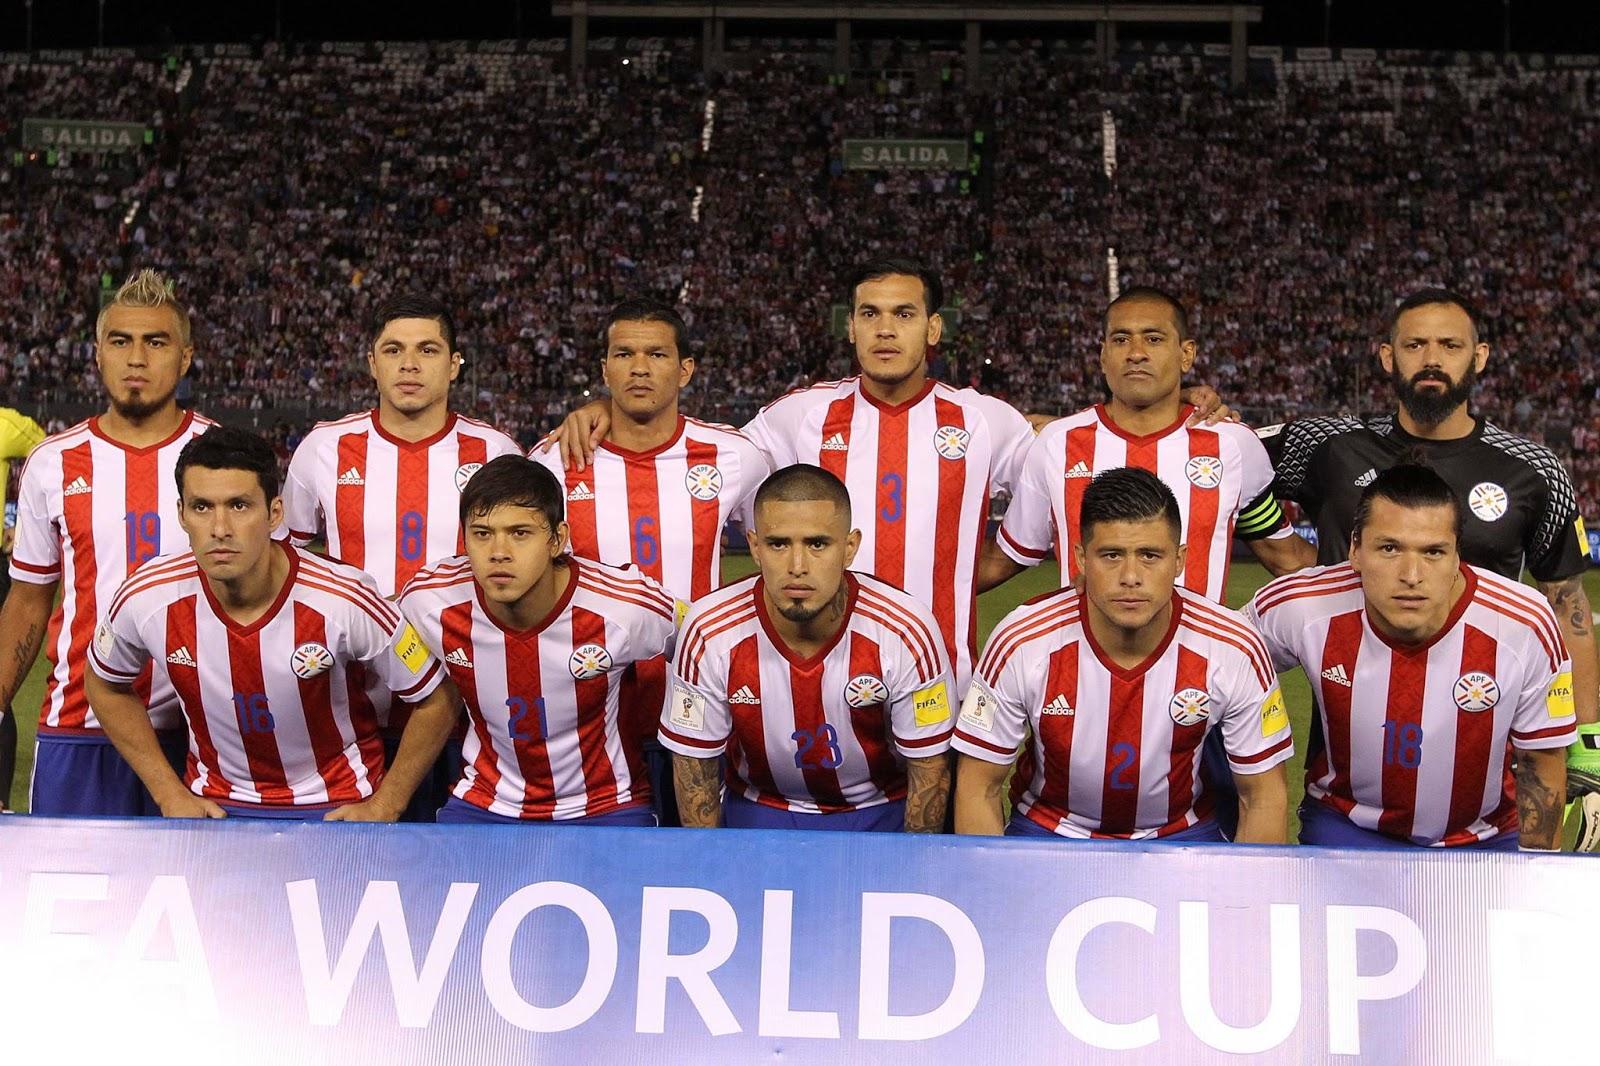 Formación de Paraguay ante Chile, Clasificatorias Rusia 2018, 1 de septiembre de 2016